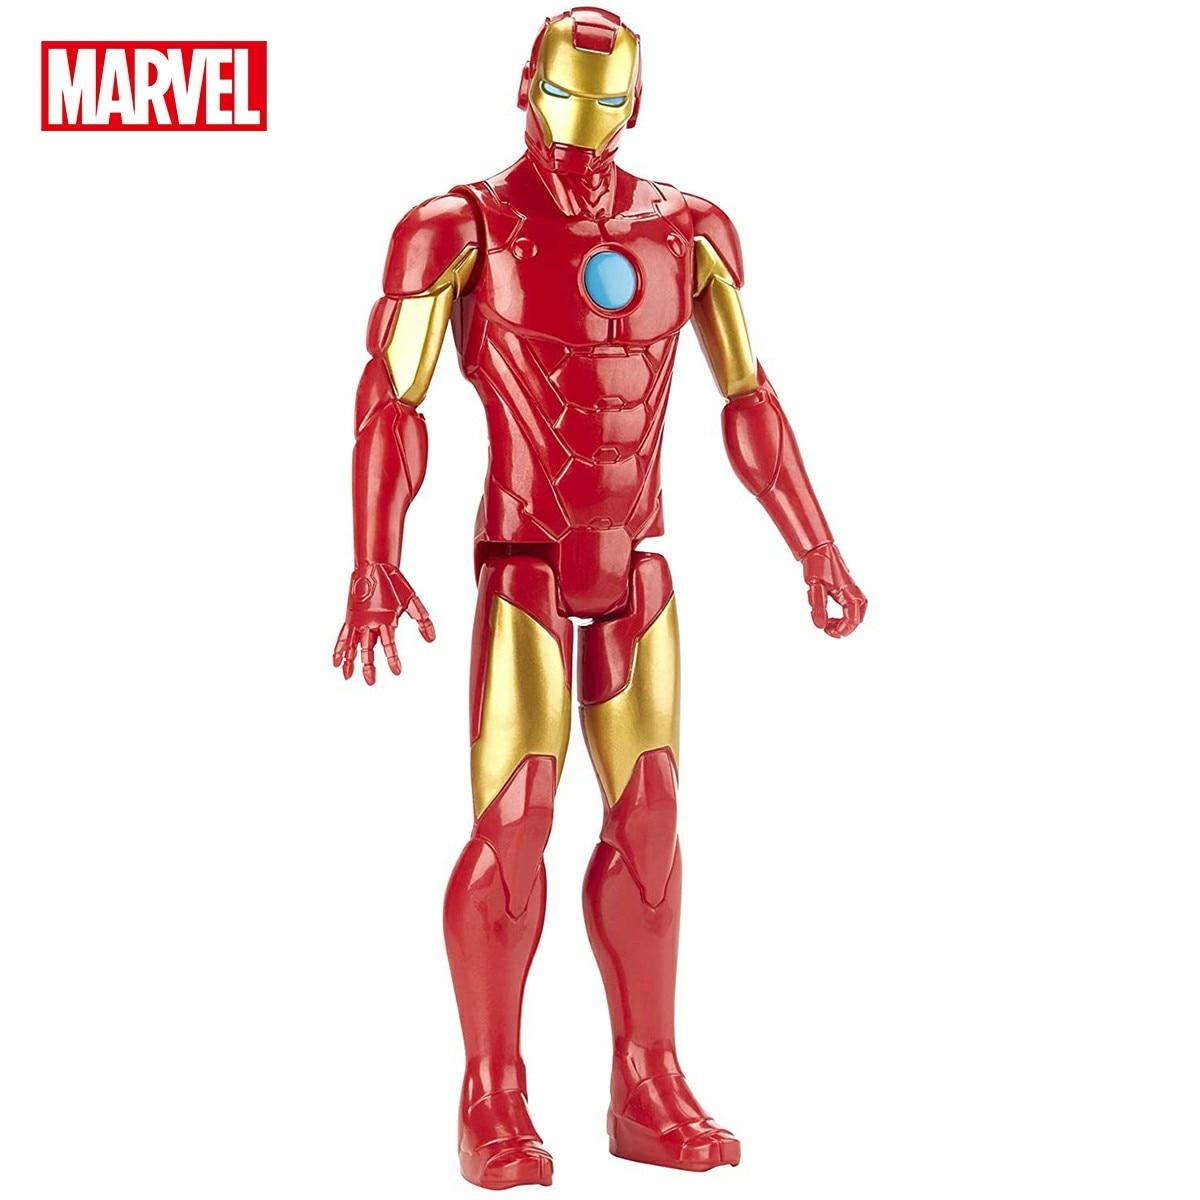 Marvel Avengers Iron Man Titan Hero Series Movie Mark Blast Gear Anime Toy Model Decoration Action Figure Over 4 Years Old E7380